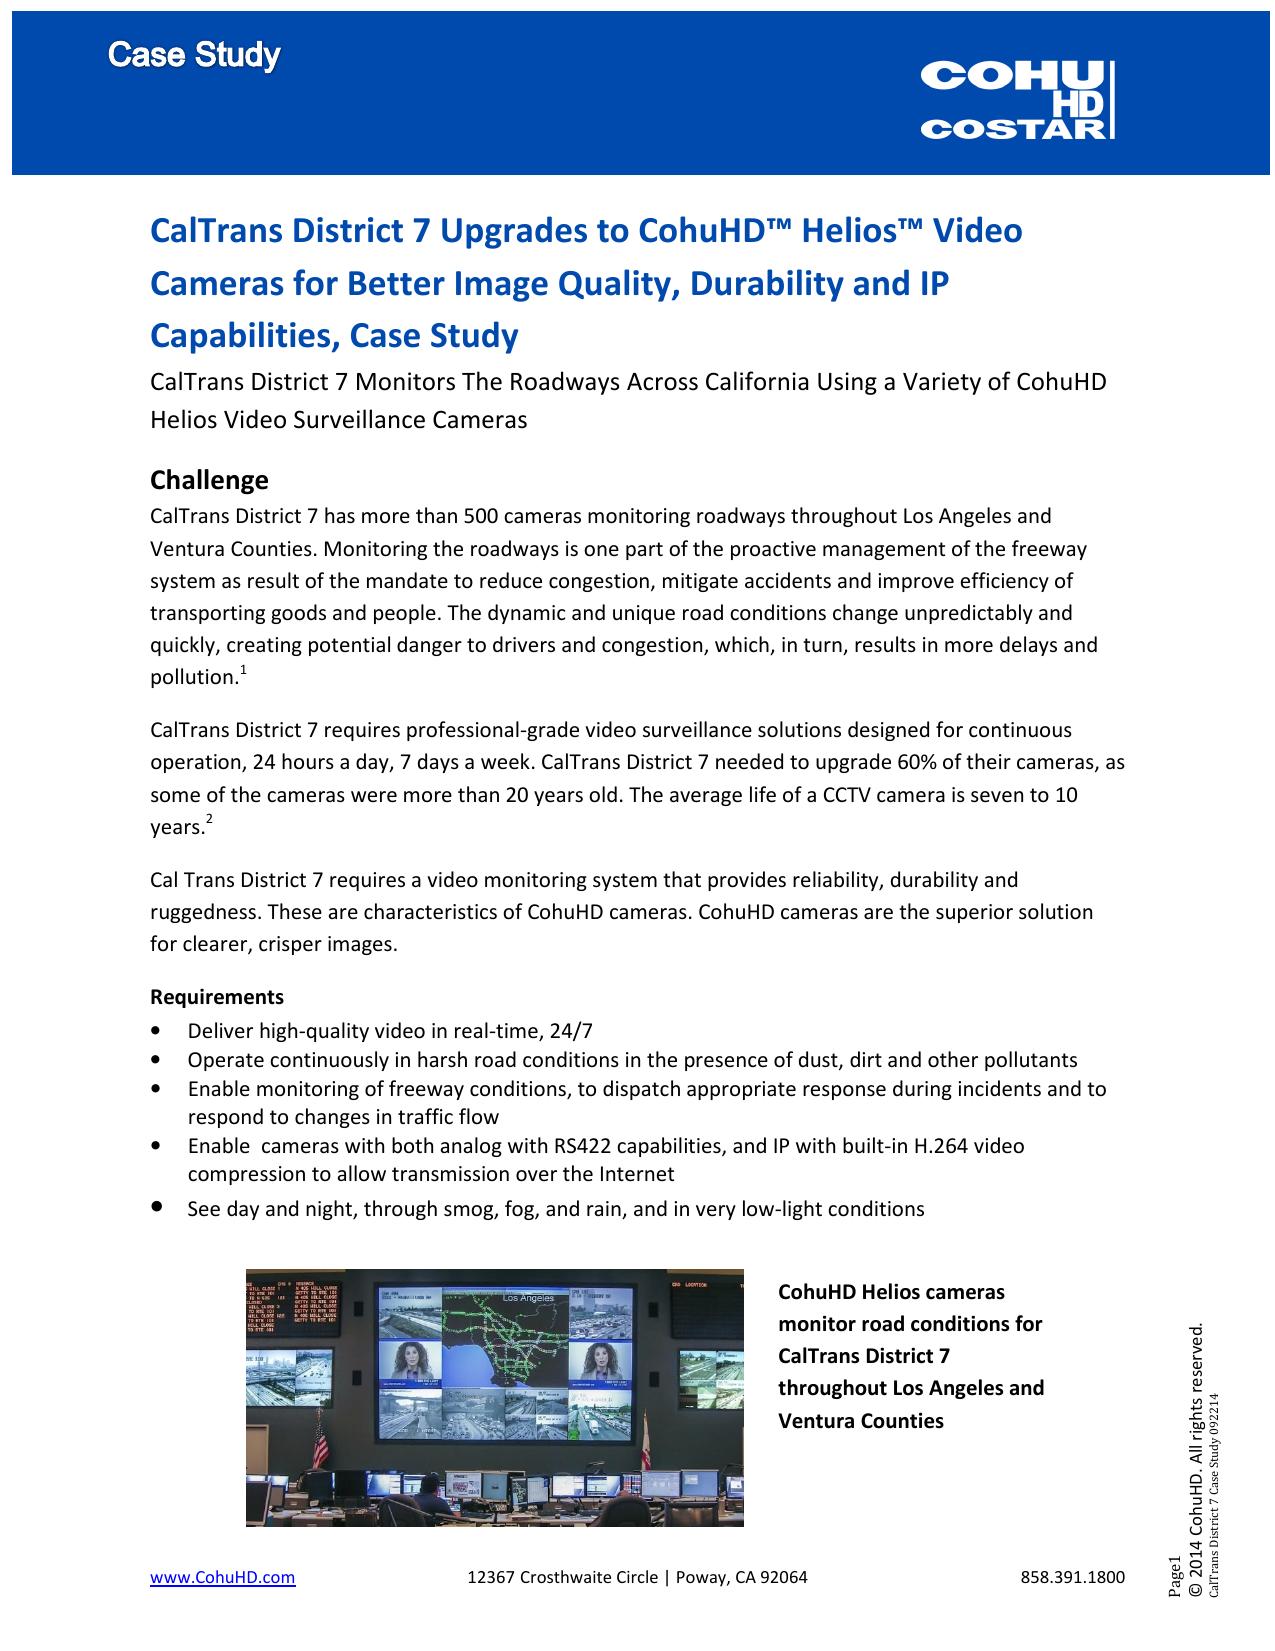 CalTrans District 7 Upgrades to CohuHD™ Helios™ Video Cameras